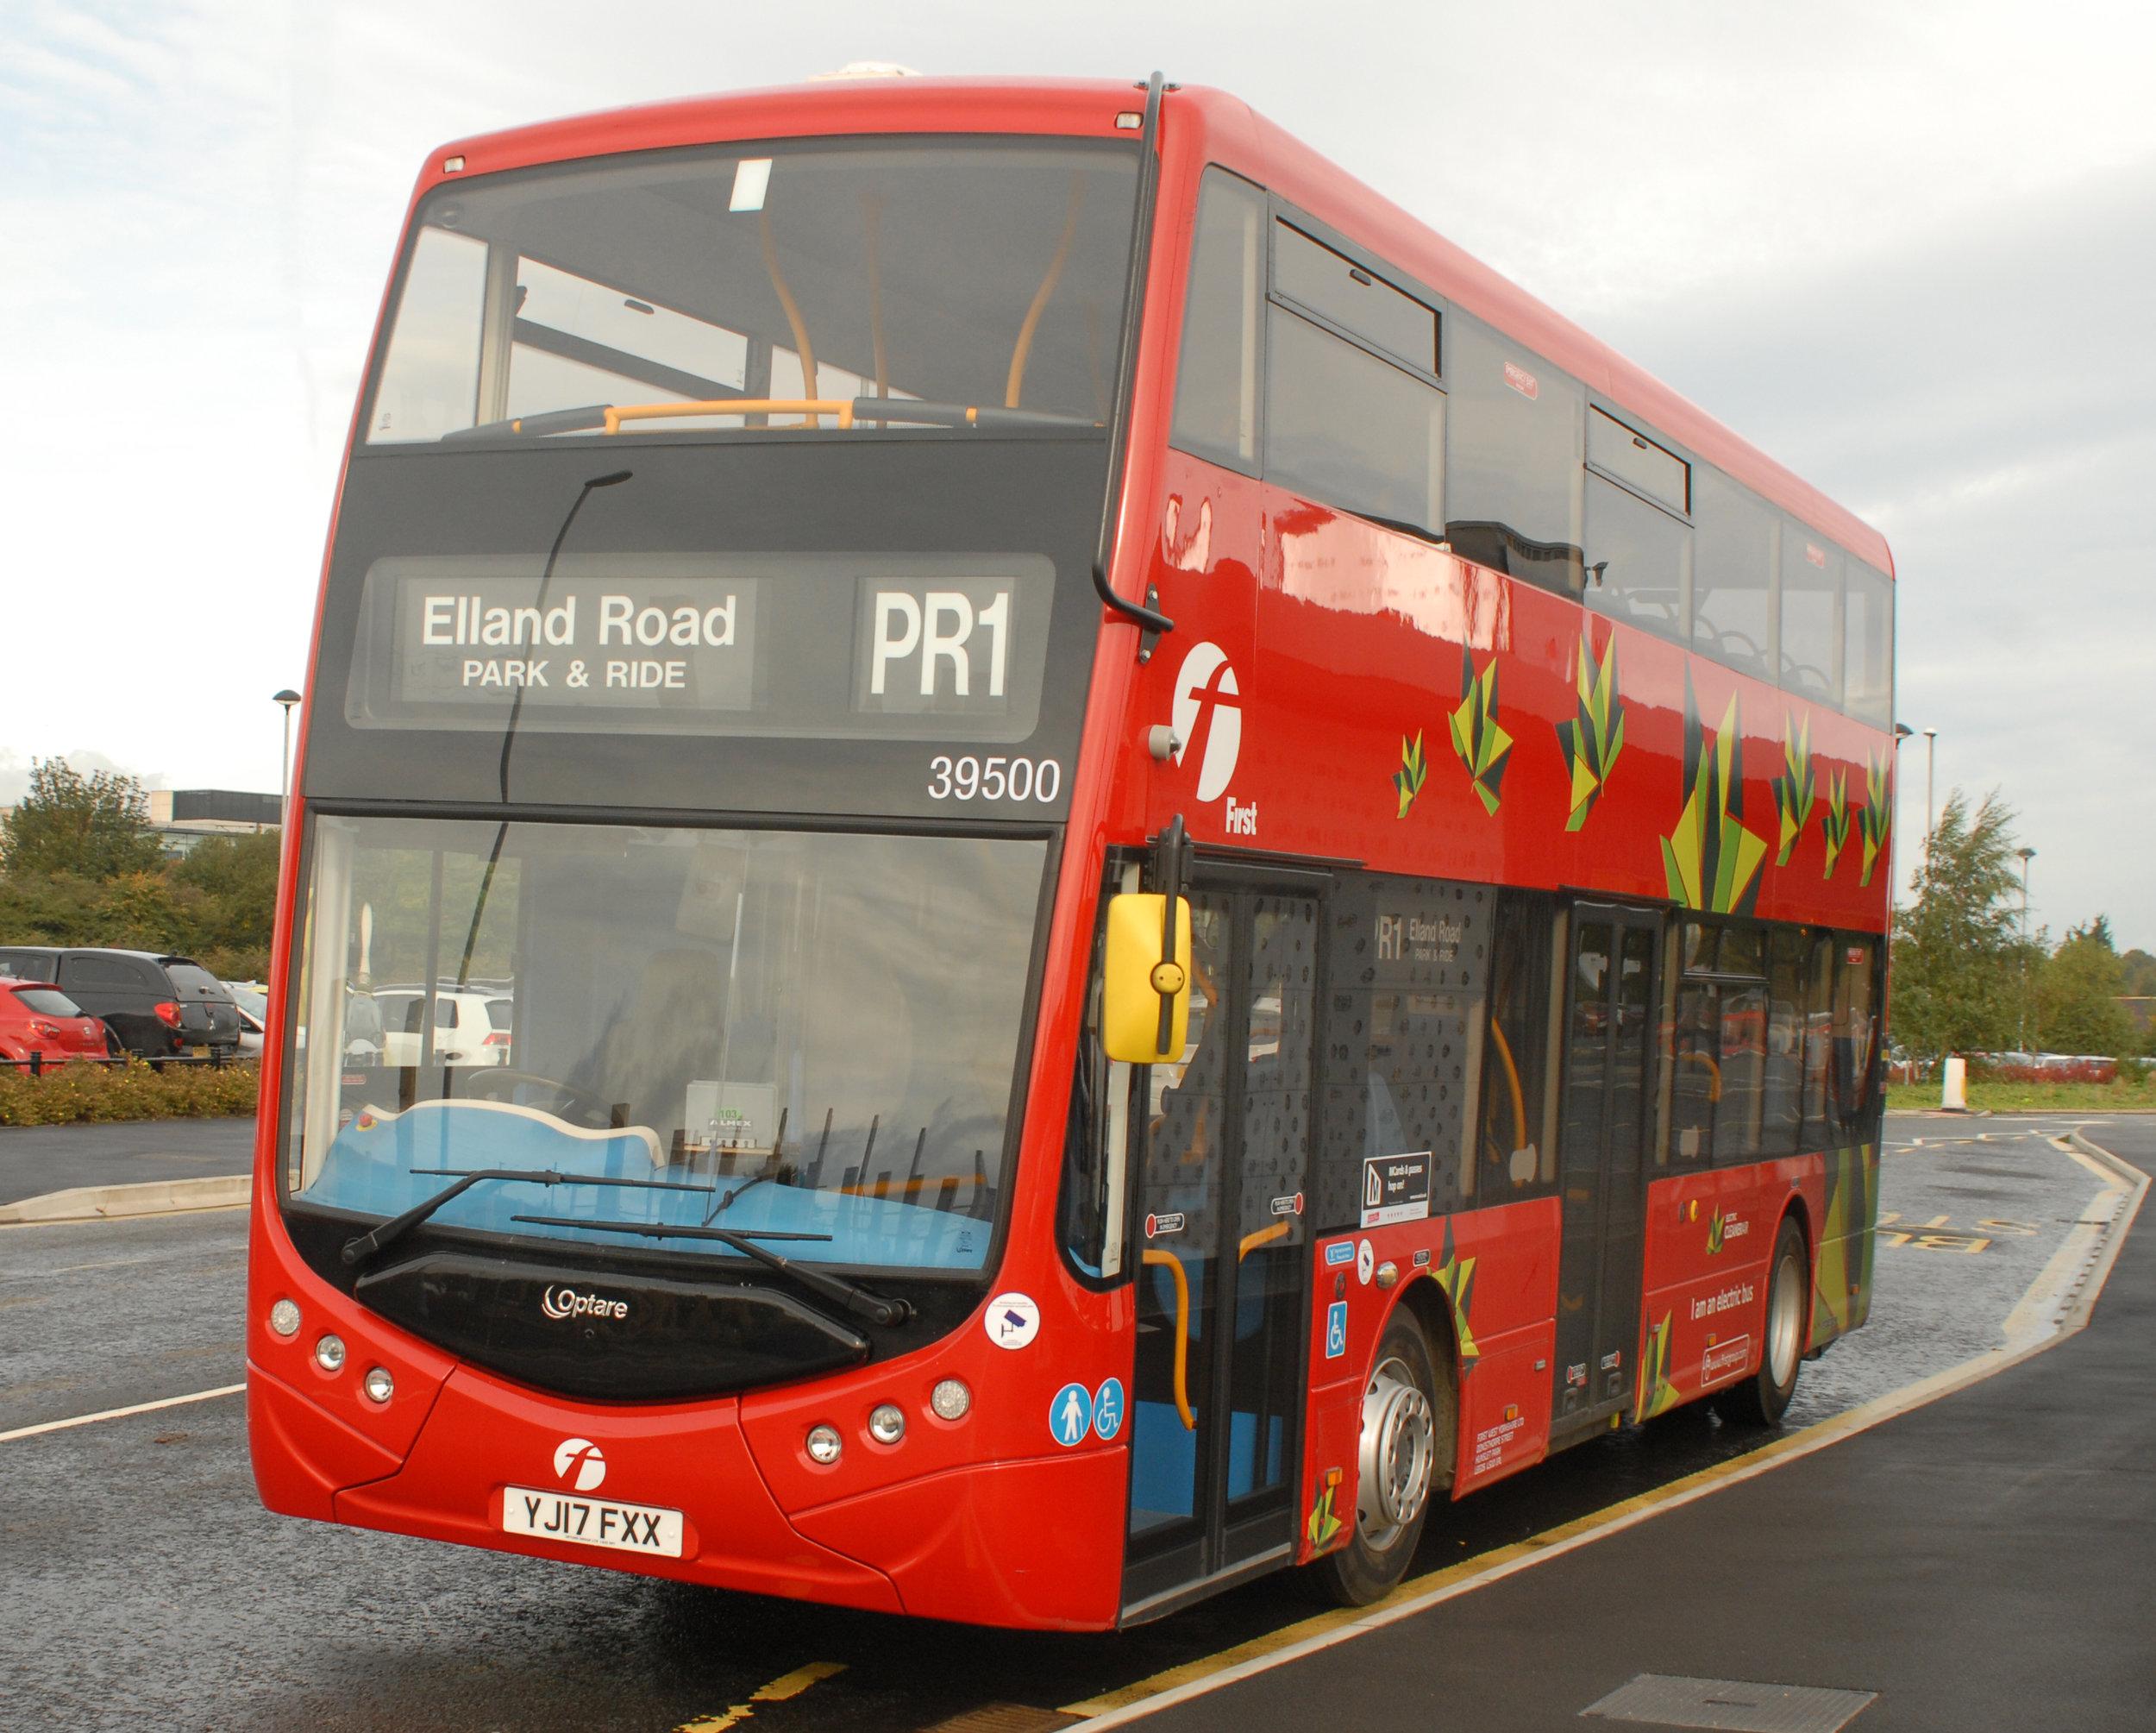 The Metrodecker EV in-service trials in Leeds last year.